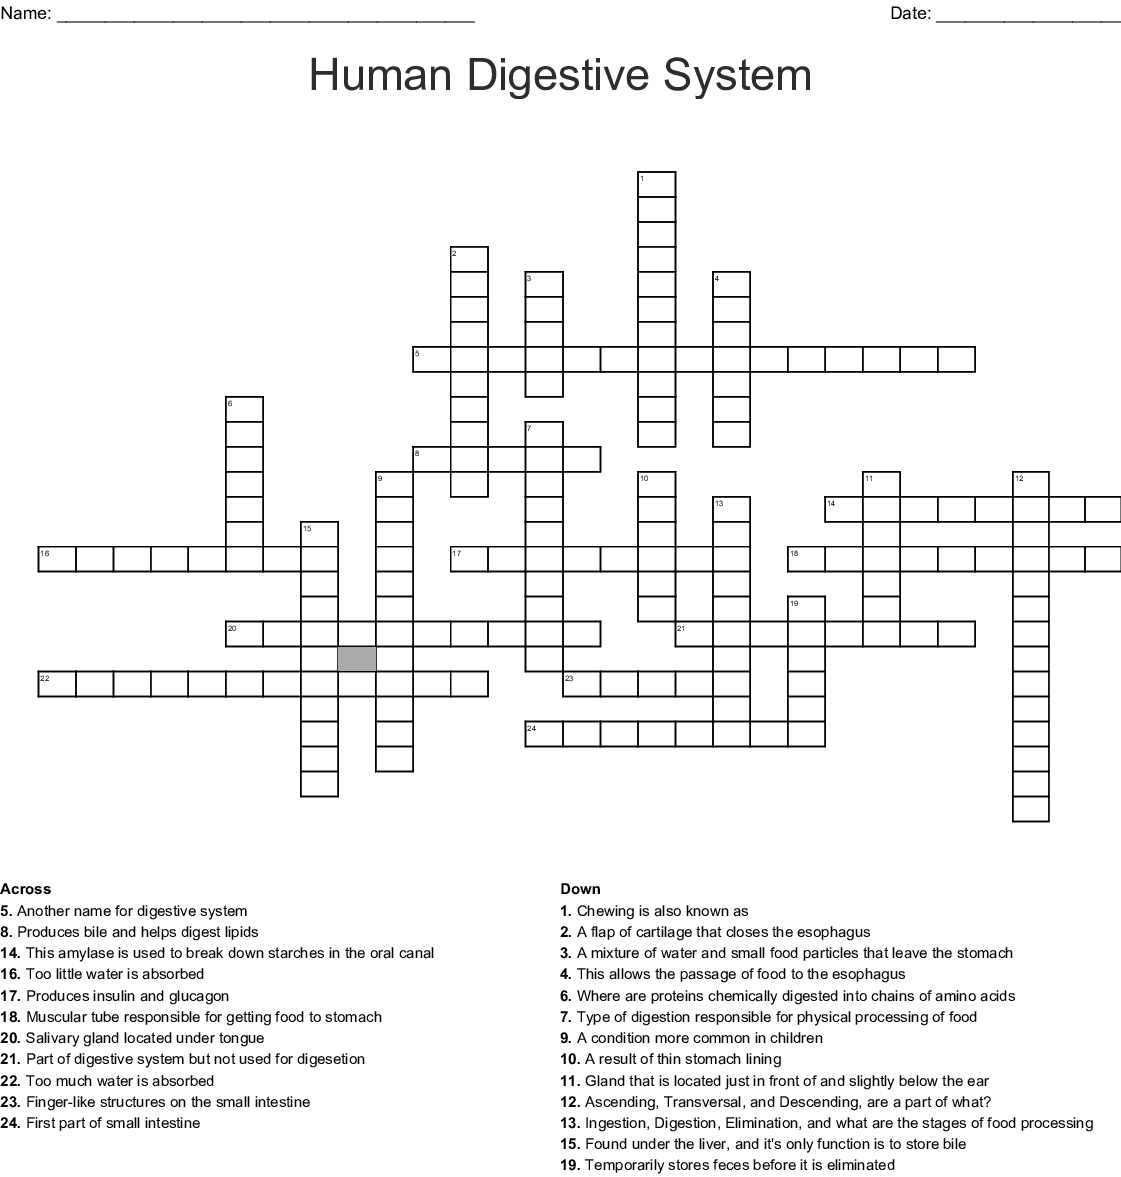 Human Digestive System Crossword